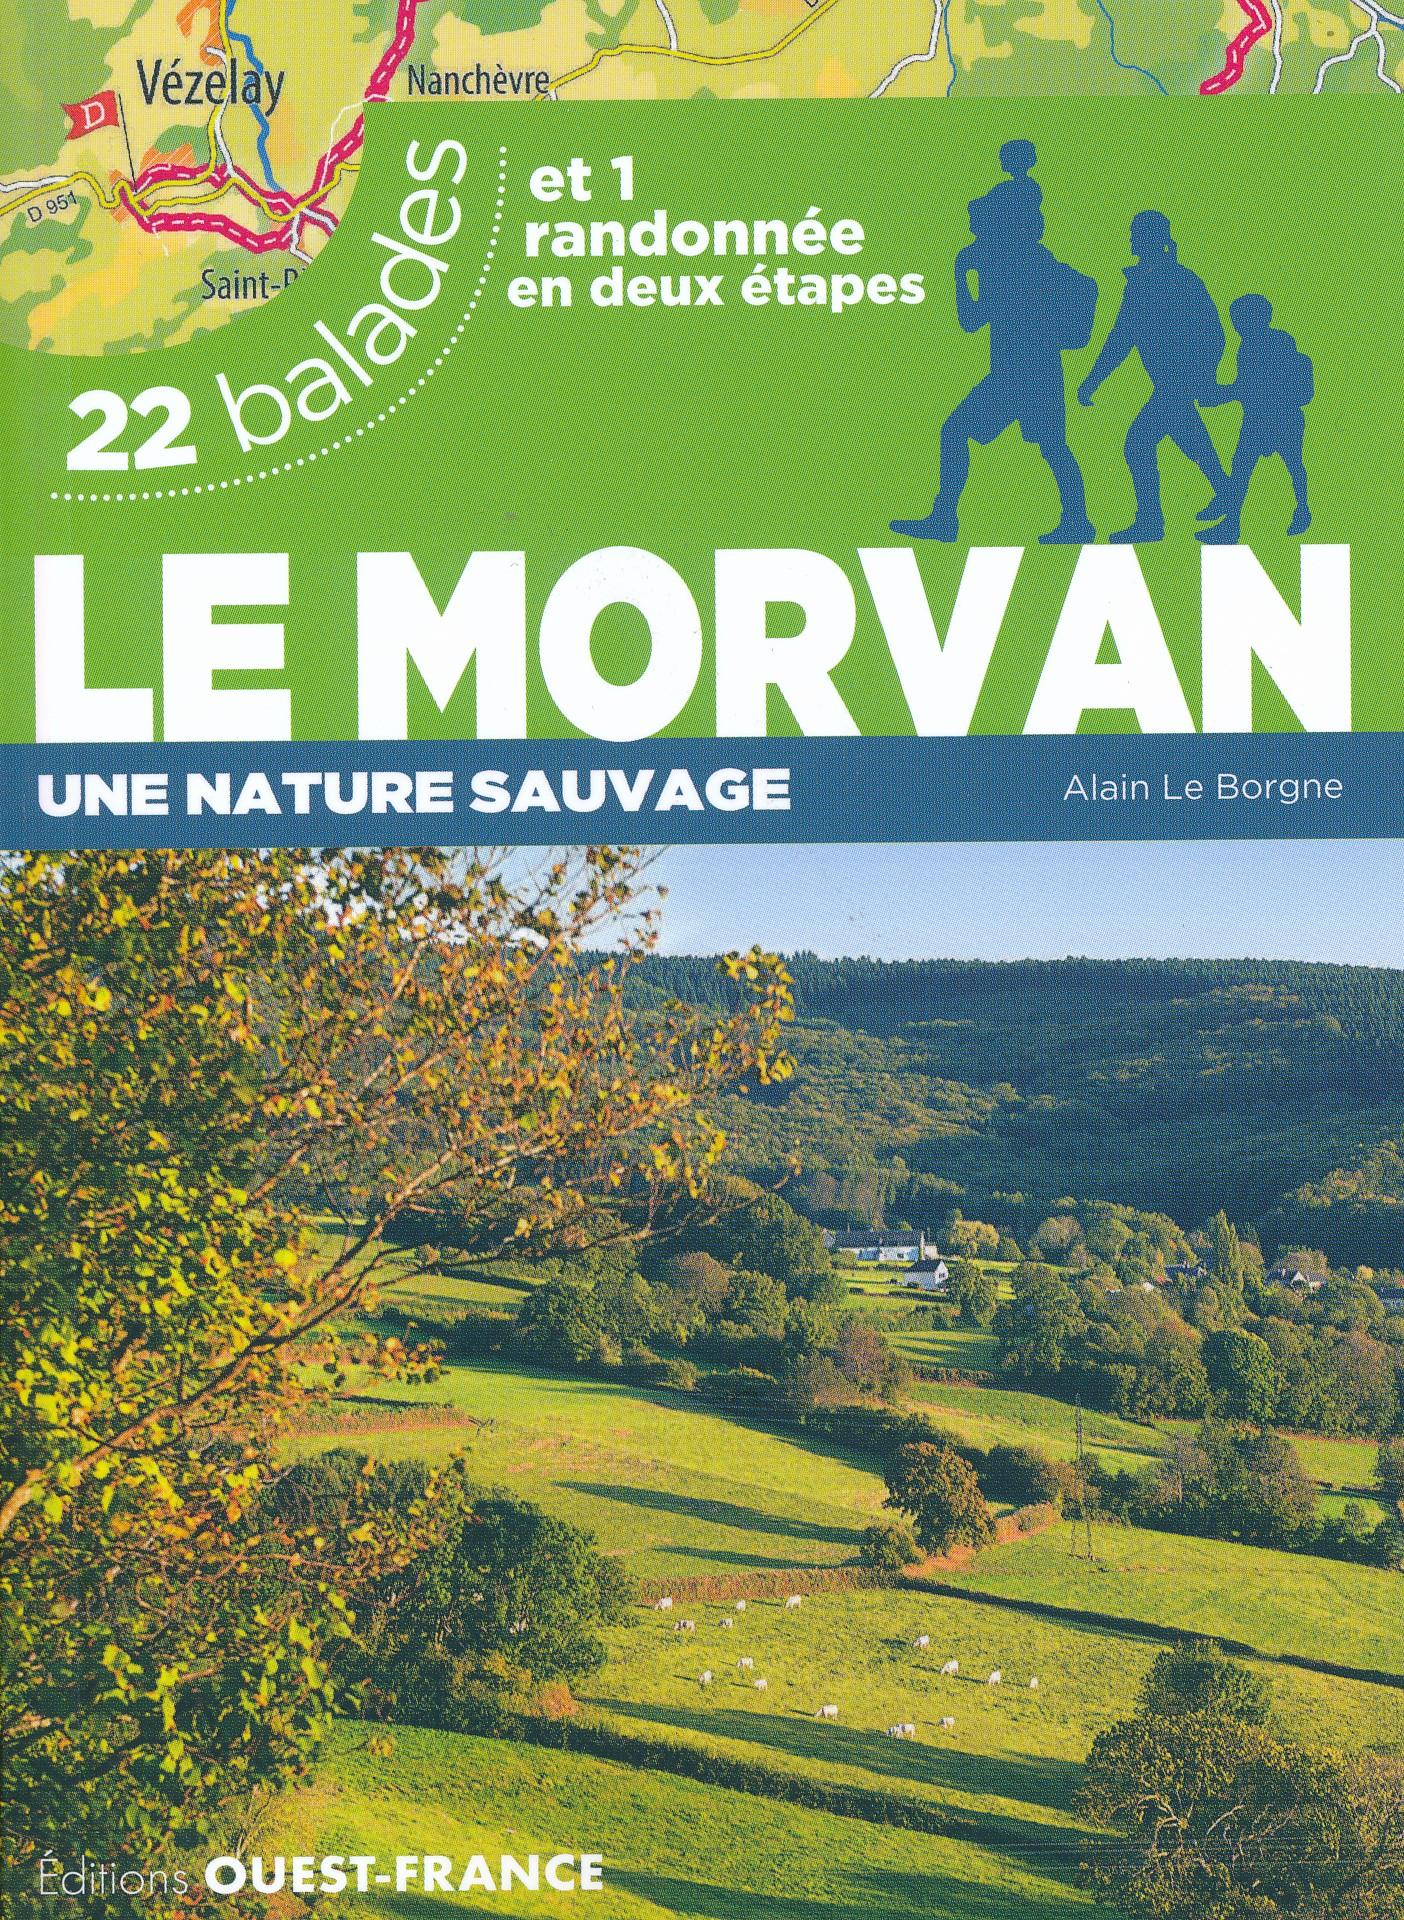 Wandelgids Le Morvan | Editions Ouest-France